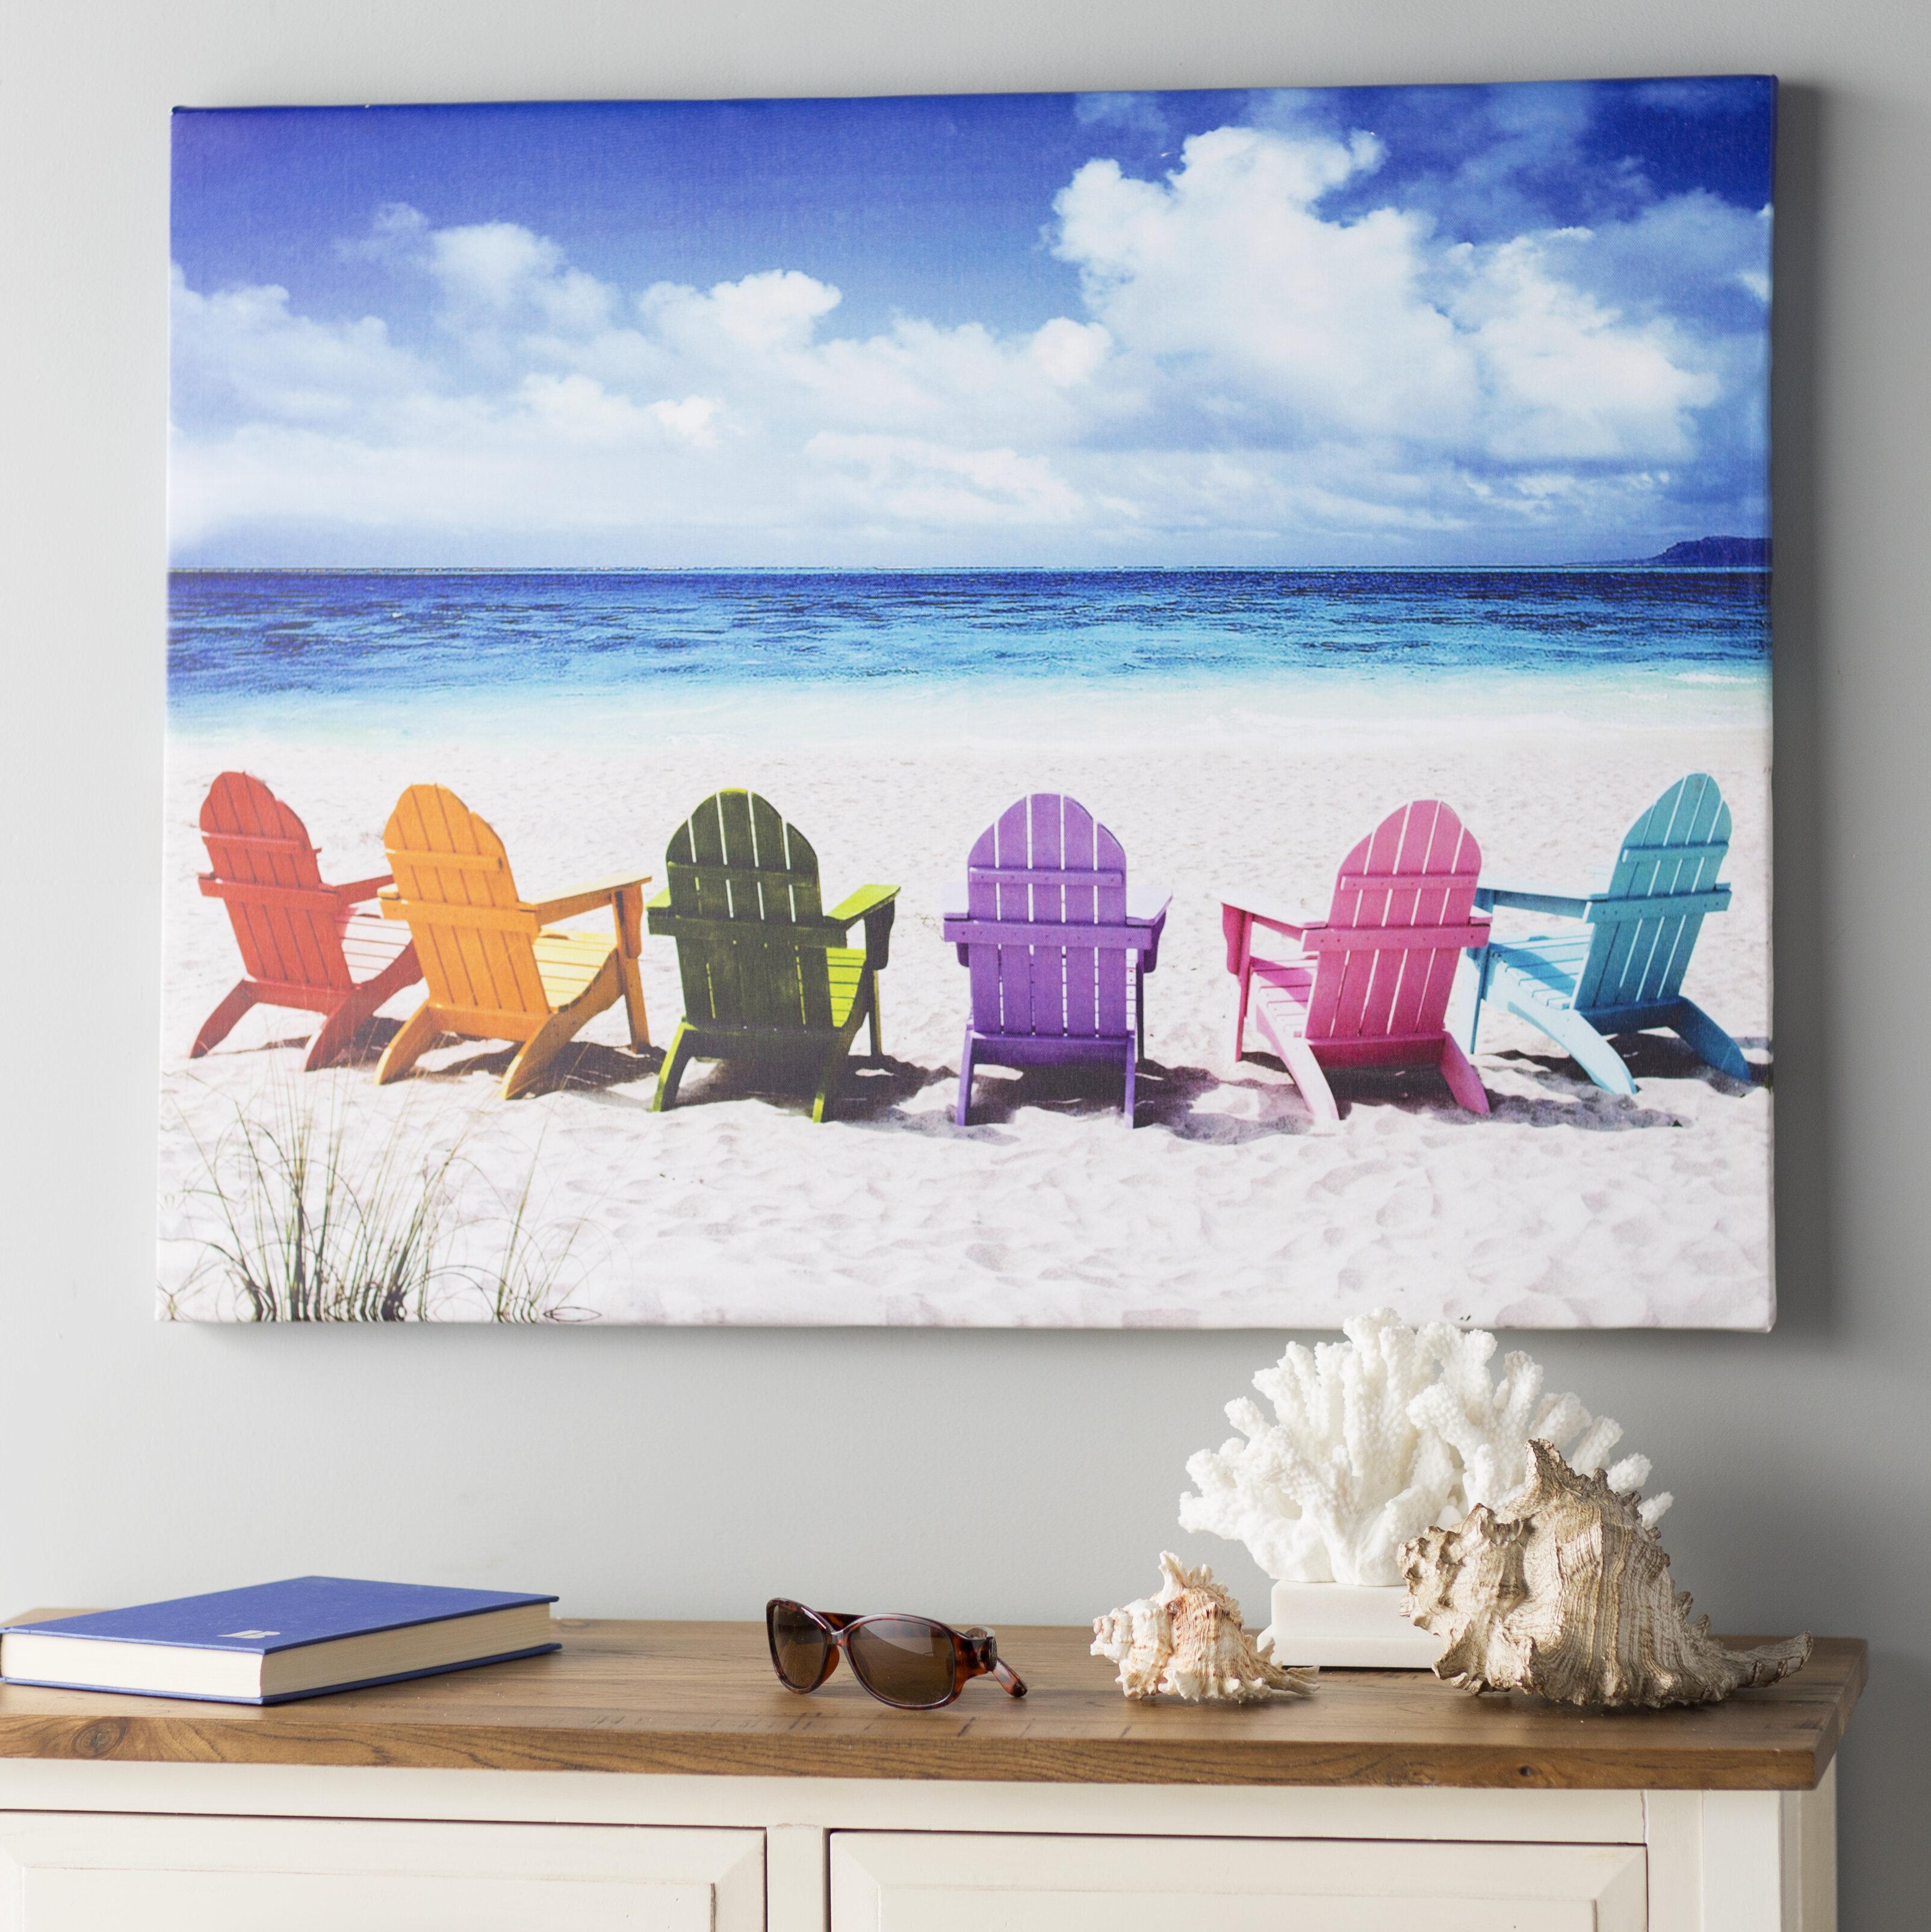 Beachcrest Home U0027Peekskill Beach Chairsu0027 Photographic Print On Wrapped  Canvas U0026 Reviews   Wayfair